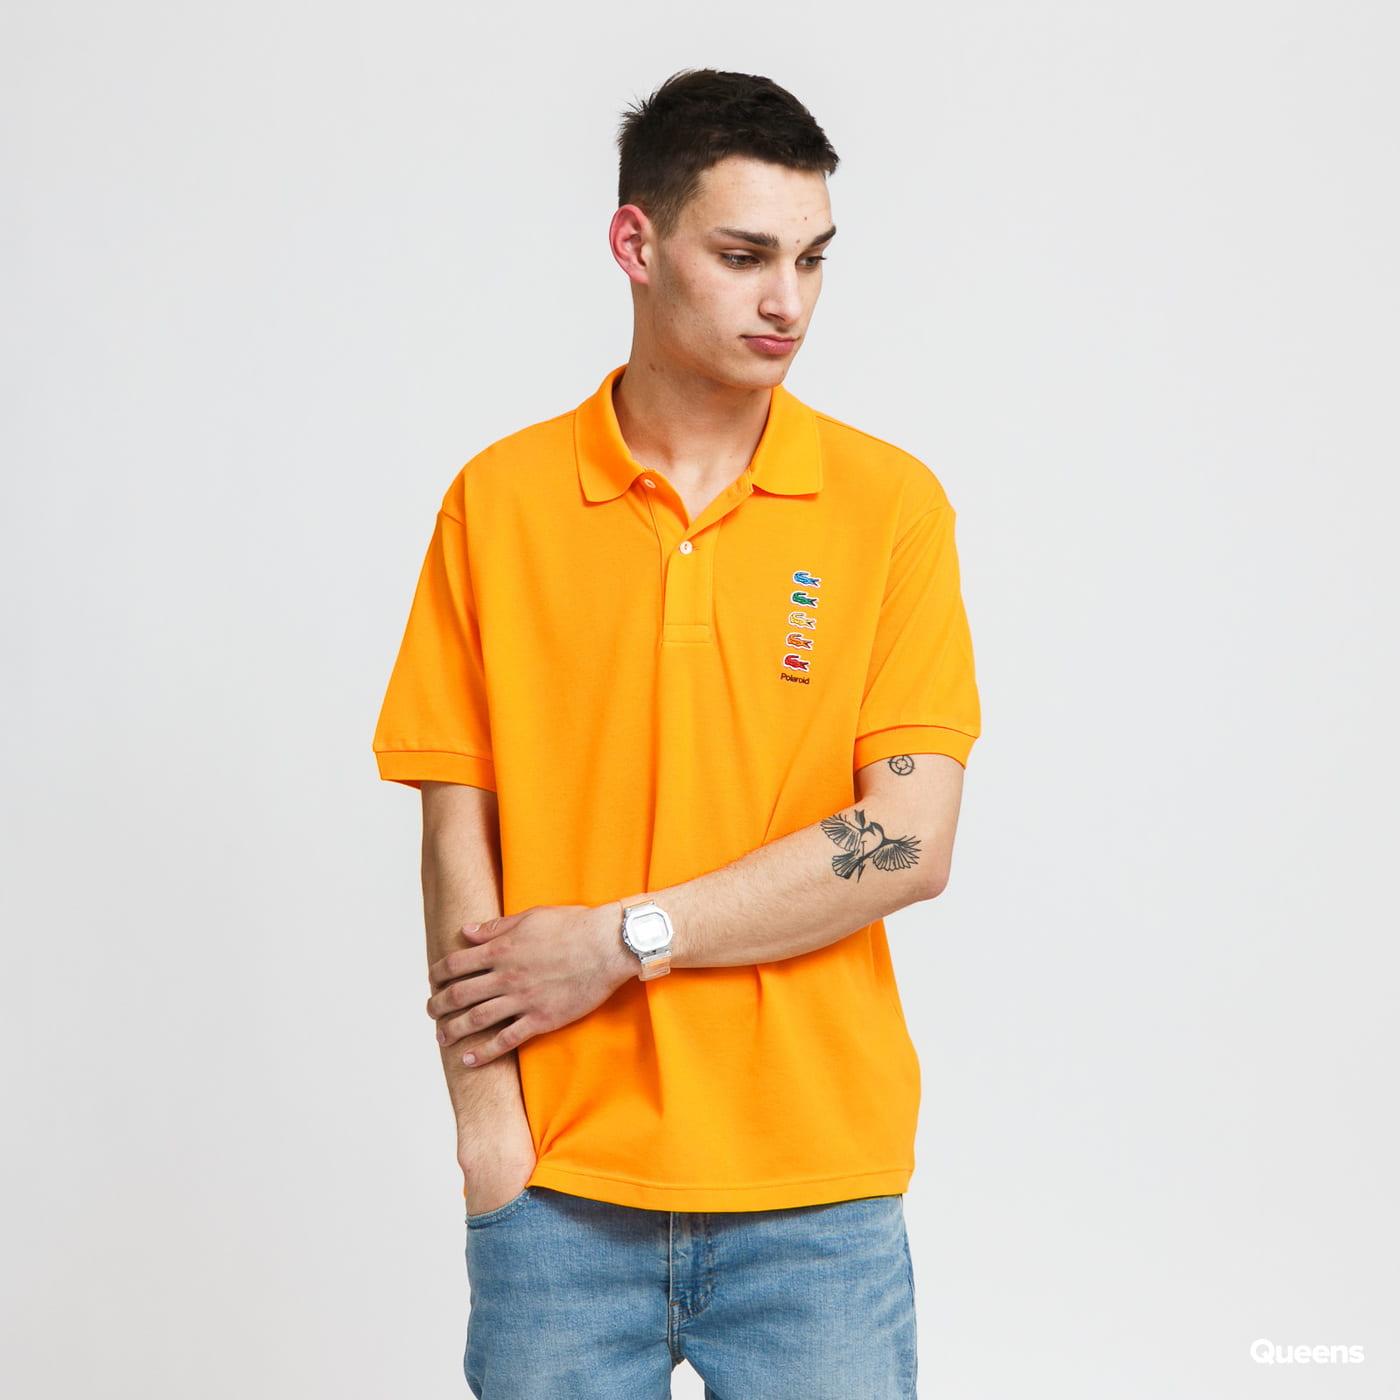 LACOSTE Men's Lacoste x Polaroid Coloured Crocodiles Classic Fit Polo Shirt orange